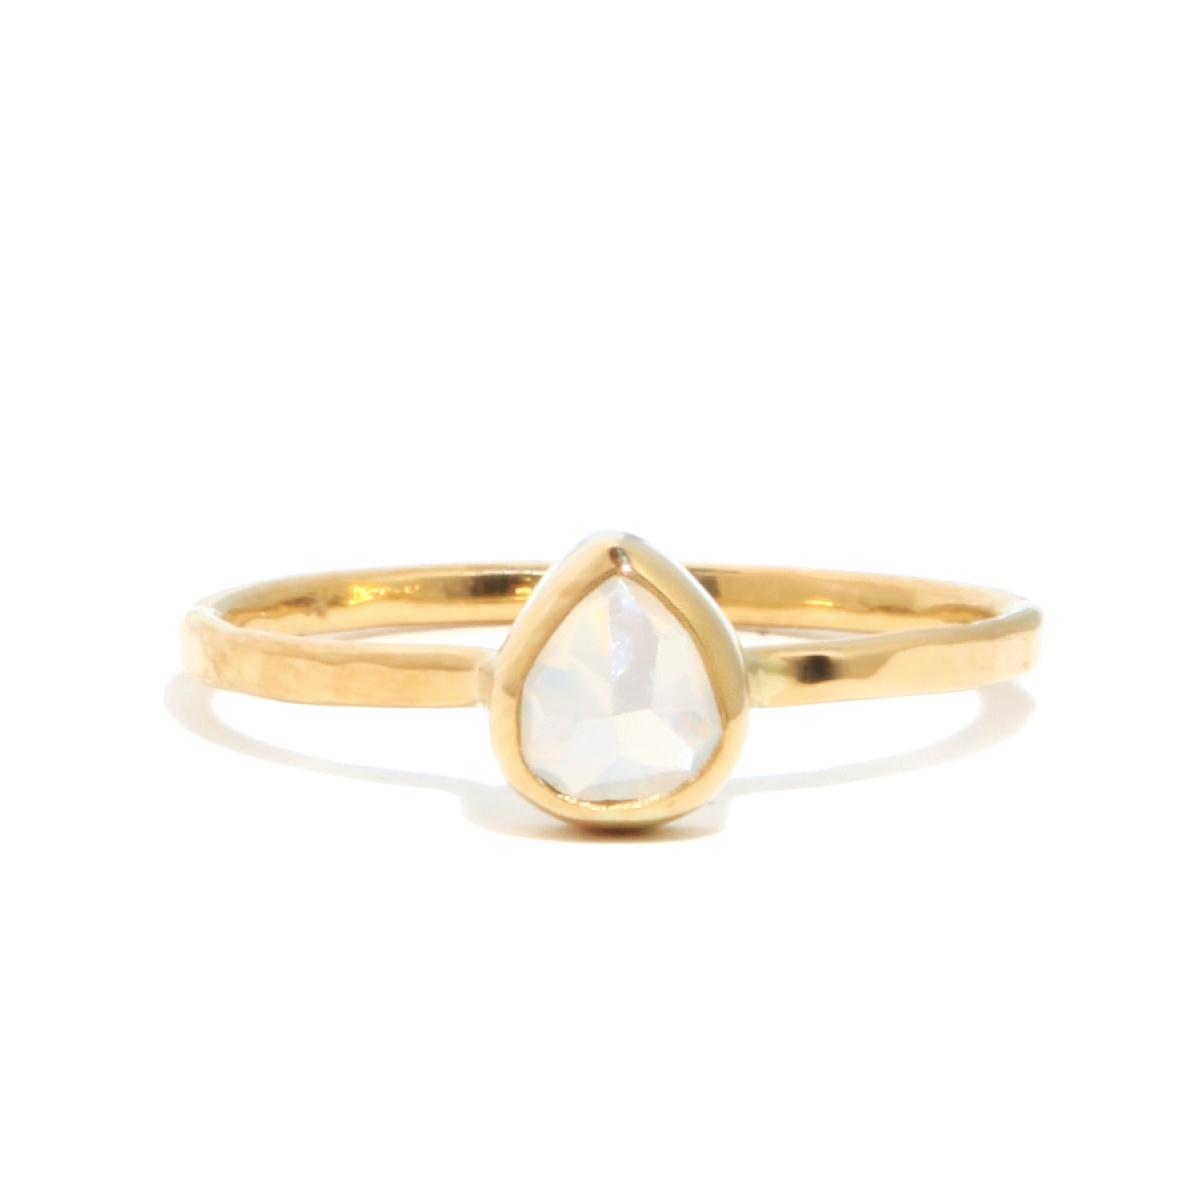 Melissa joy manning 1 Carat Grey And Clear Teardrop Diamond Ring in Gray